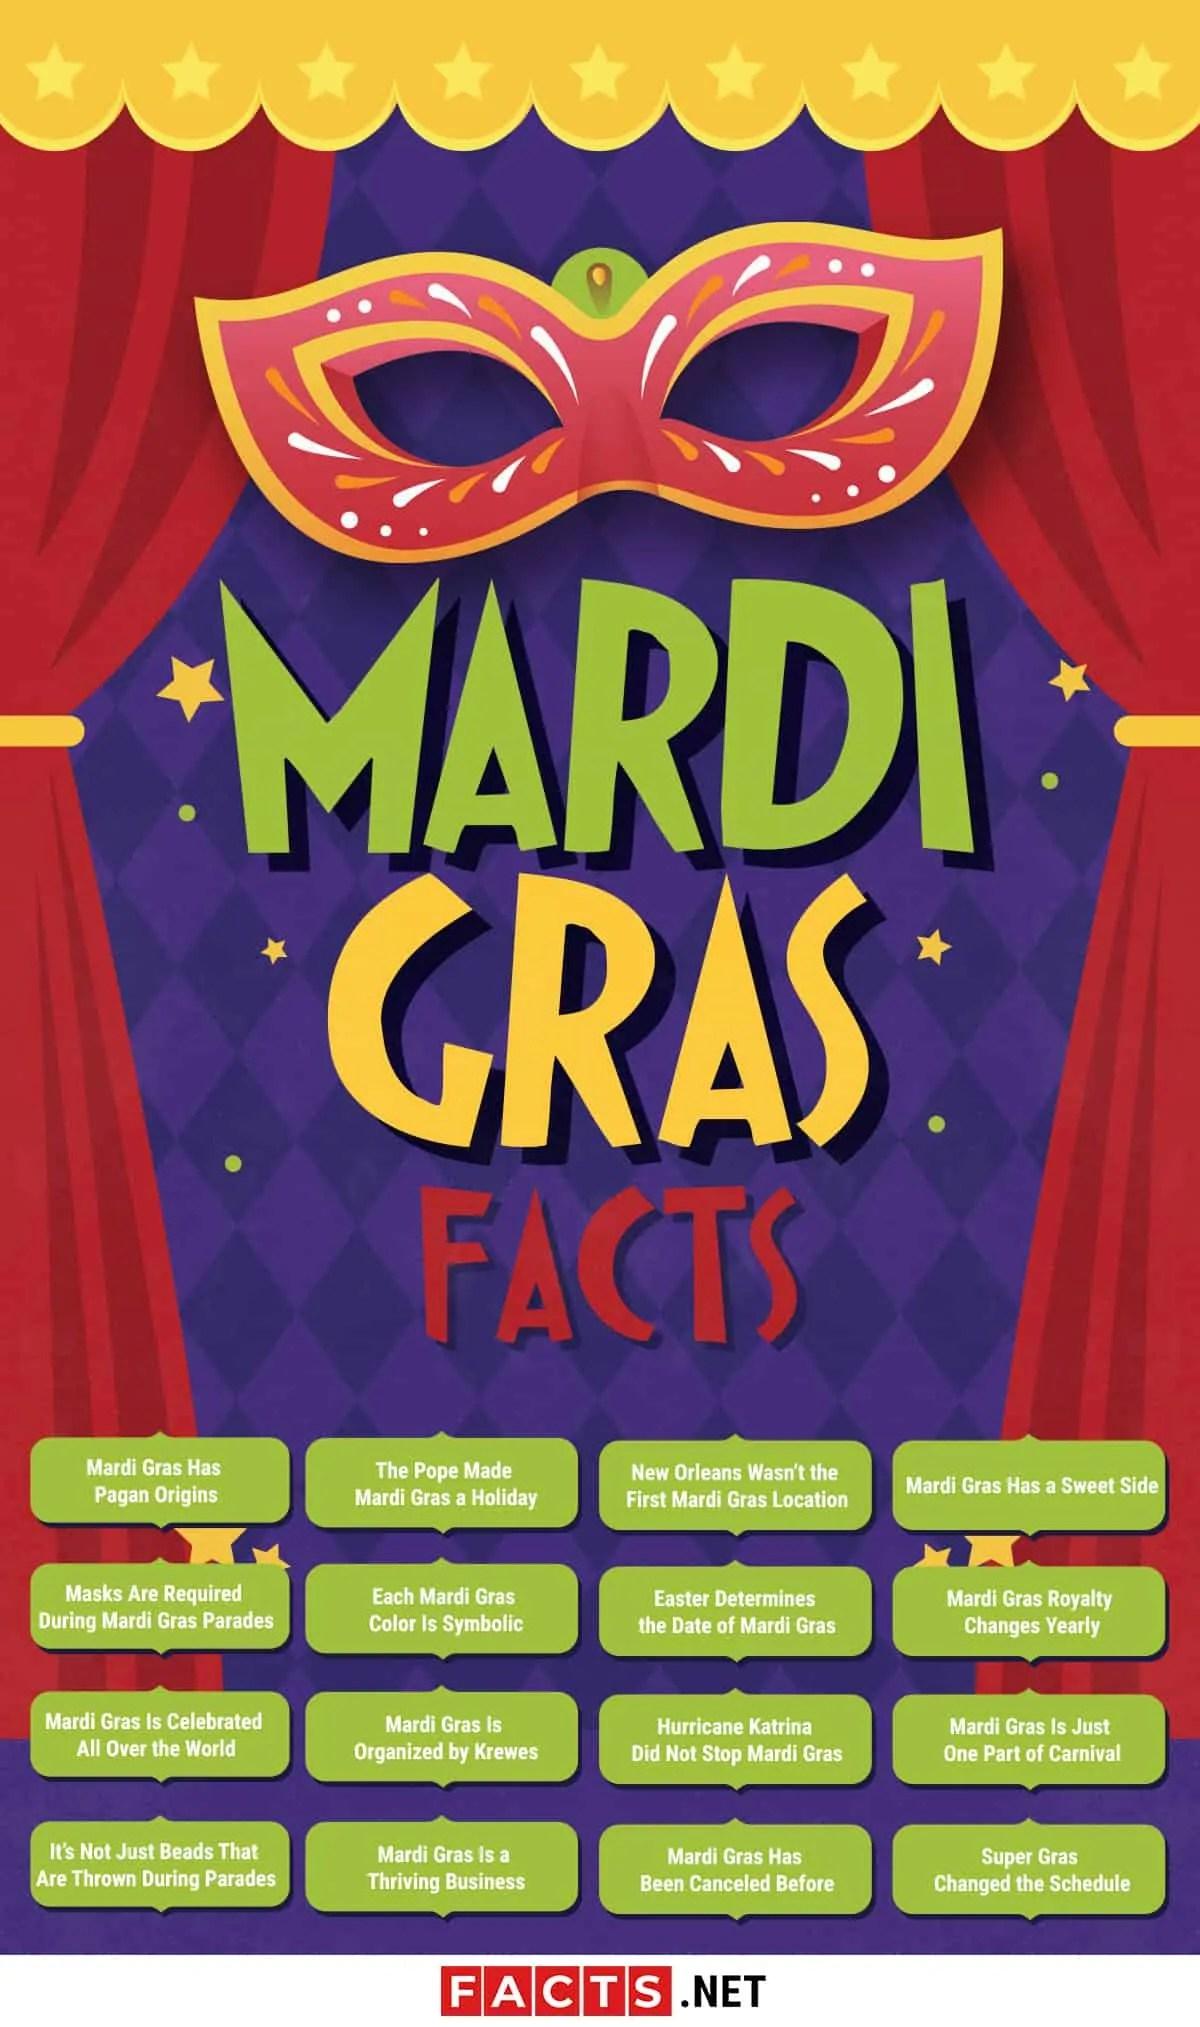 Top 16 Mardi Gras Facts